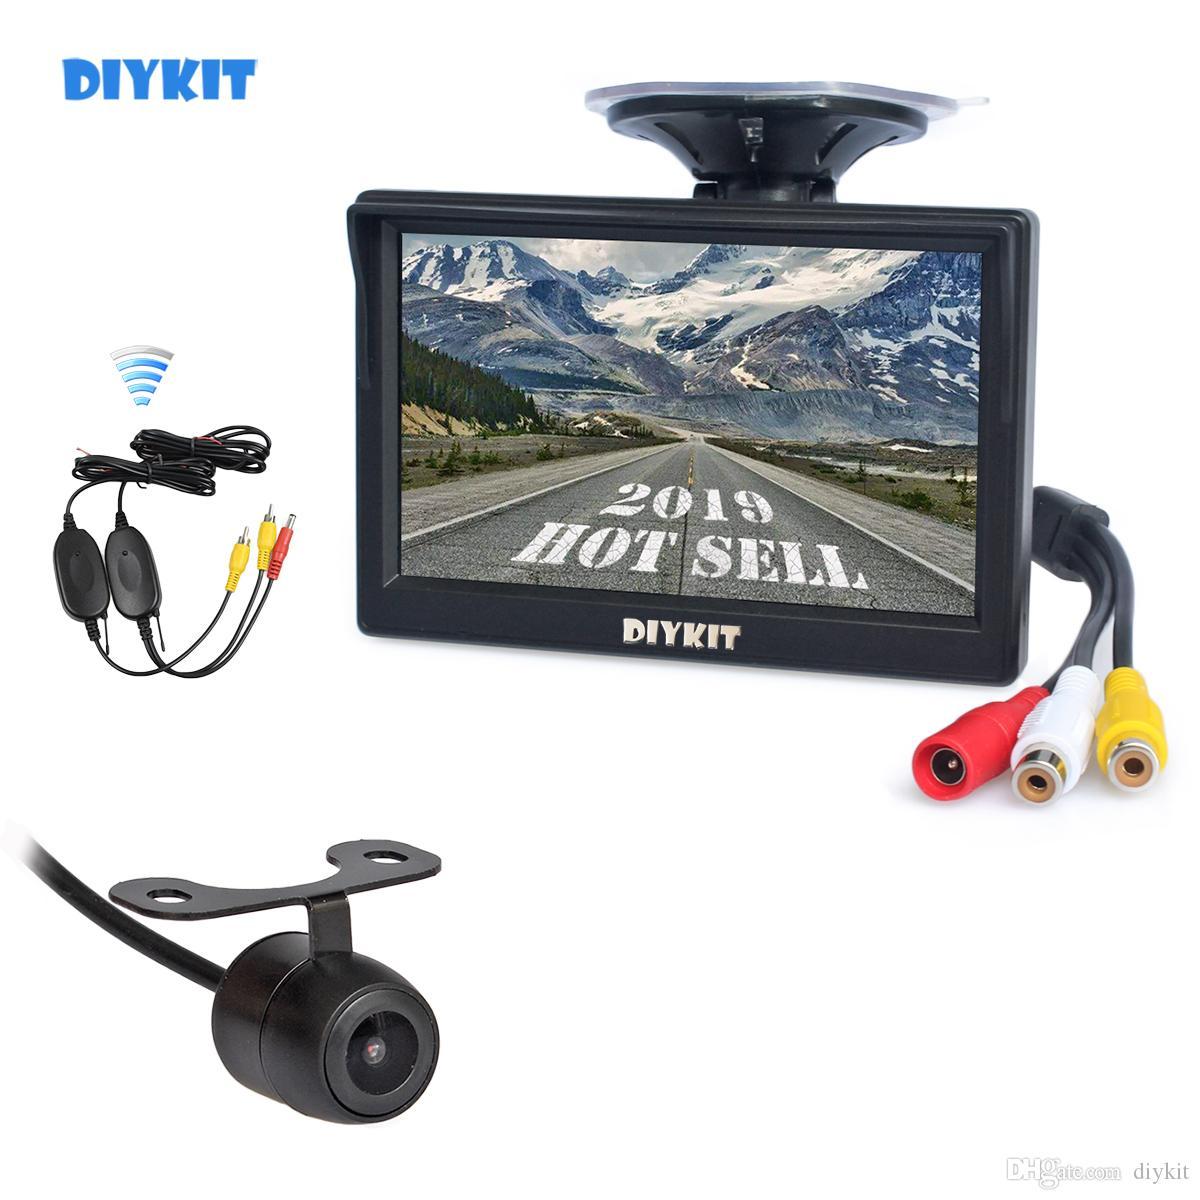 DIYKIT Wireless Parking Security System Kit 5inch Rear View Monitor Car Monitor + Waterproof HD Backup Car Camera